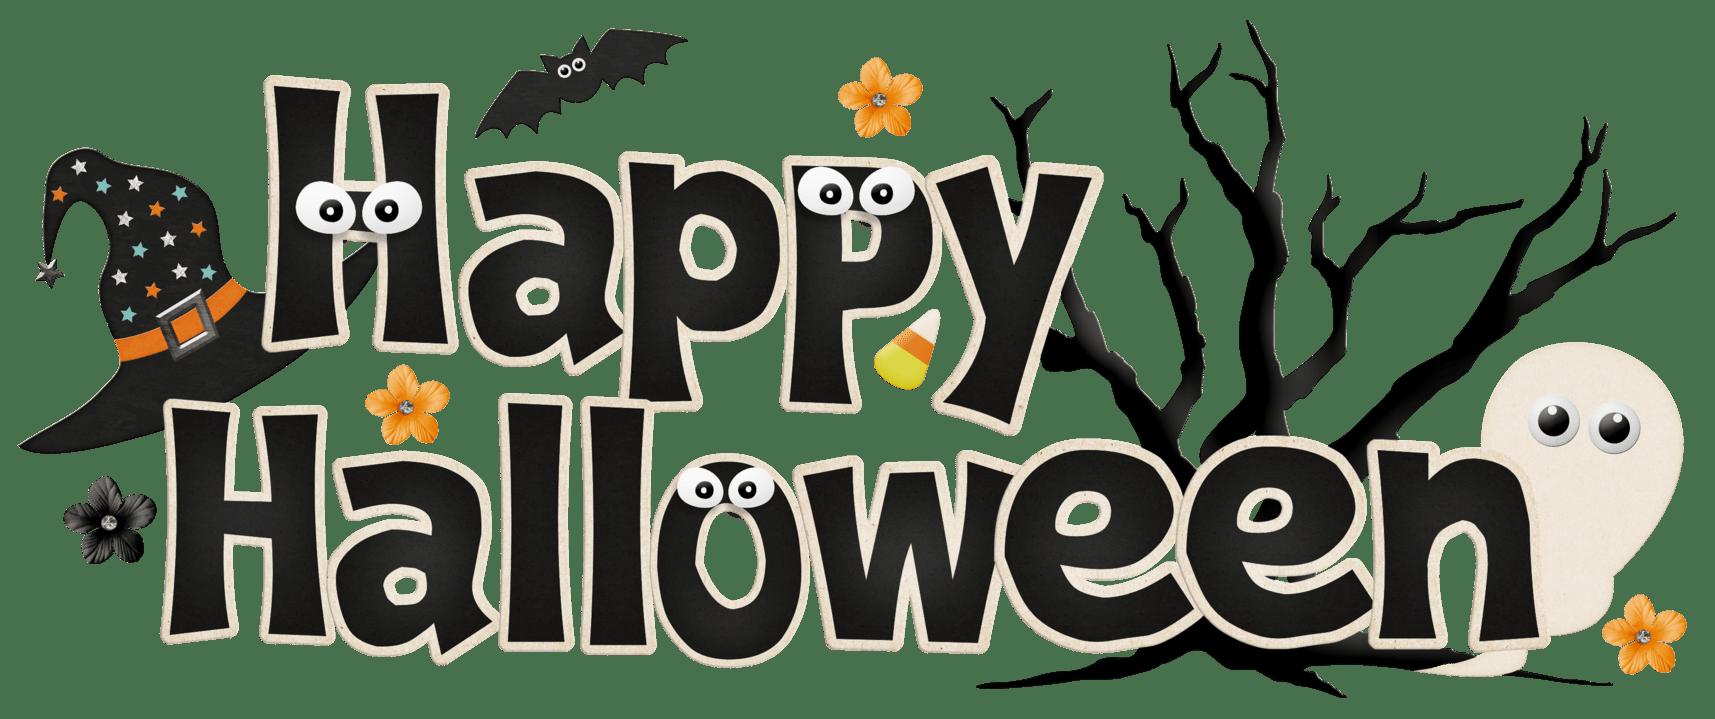 hight resolution of halloween clipart